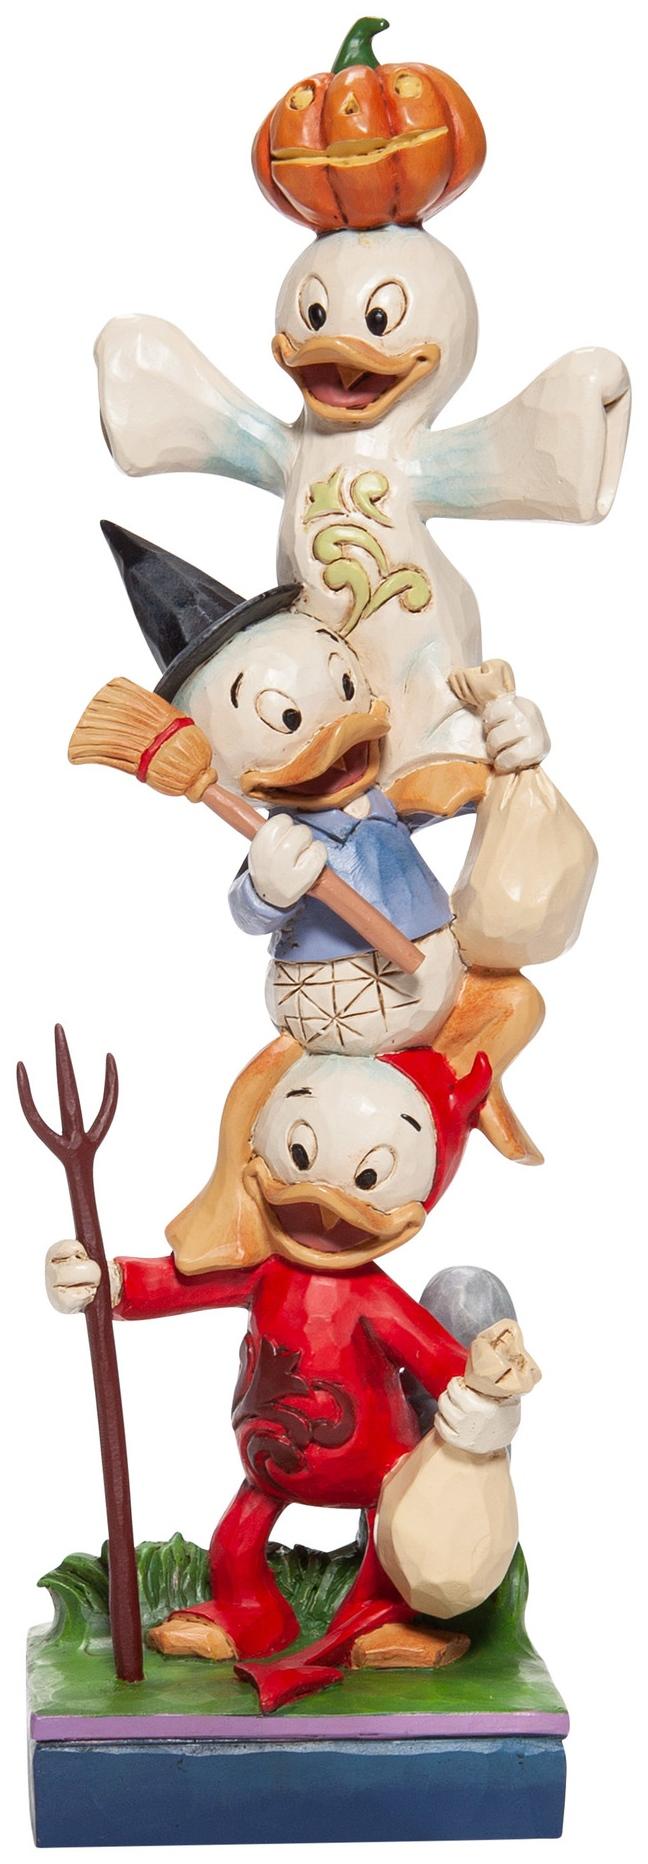 Disney Traditions by Jim Shore 6007079 Halloween Huey Dewey & Louie Figurine